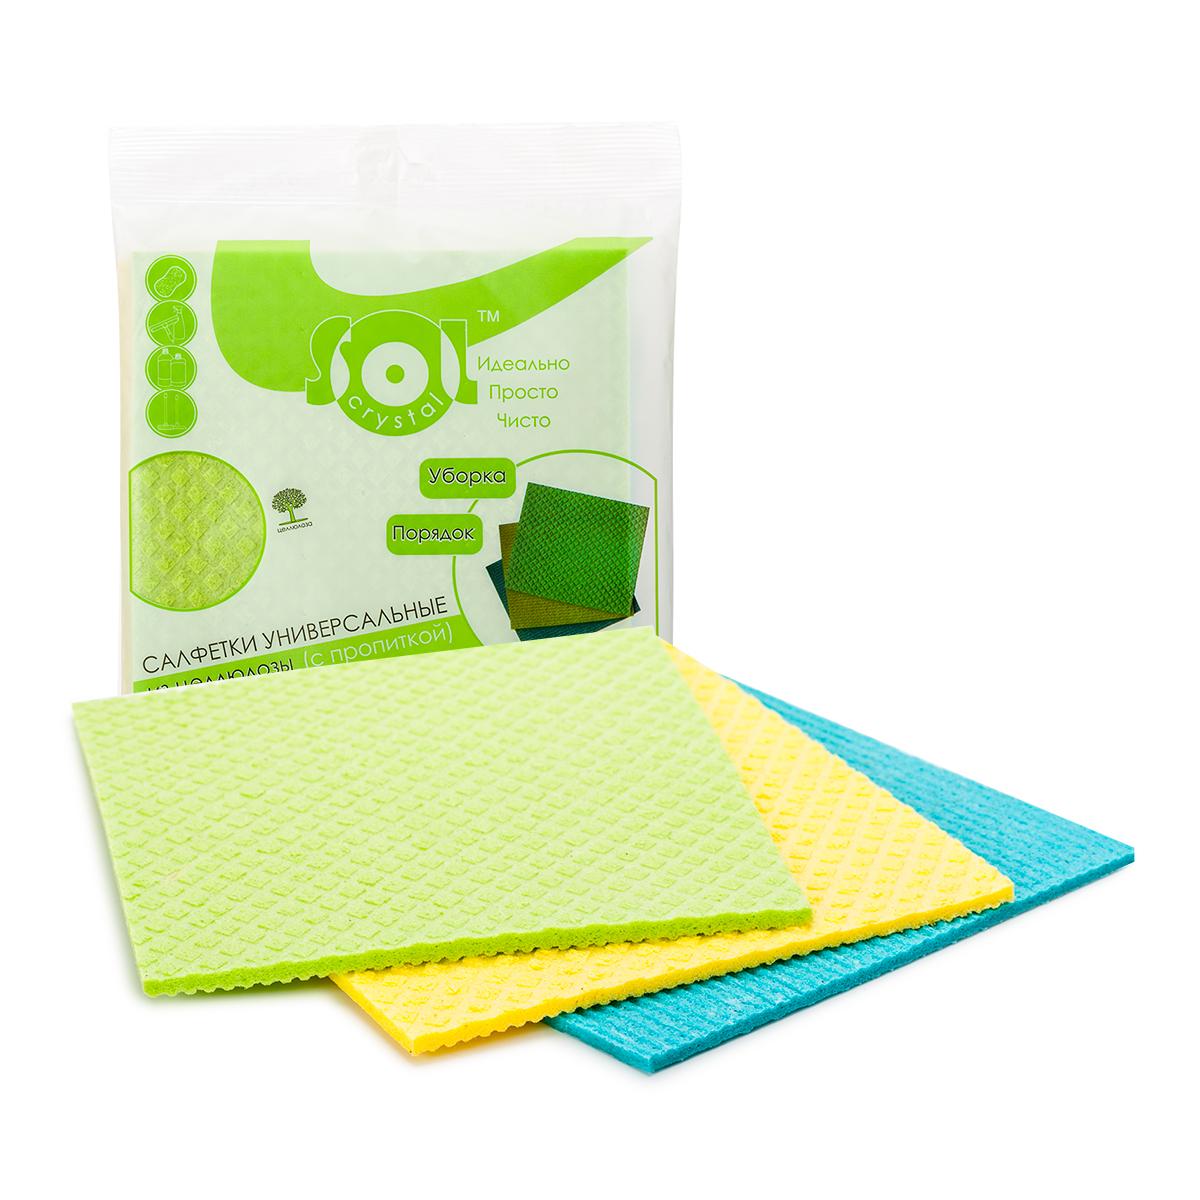 Салфетка для уборки Sol Crystal Cale, 18 x 20 см, 3 шт. 20002 салфетки для уборки top gear салфетка для уборки